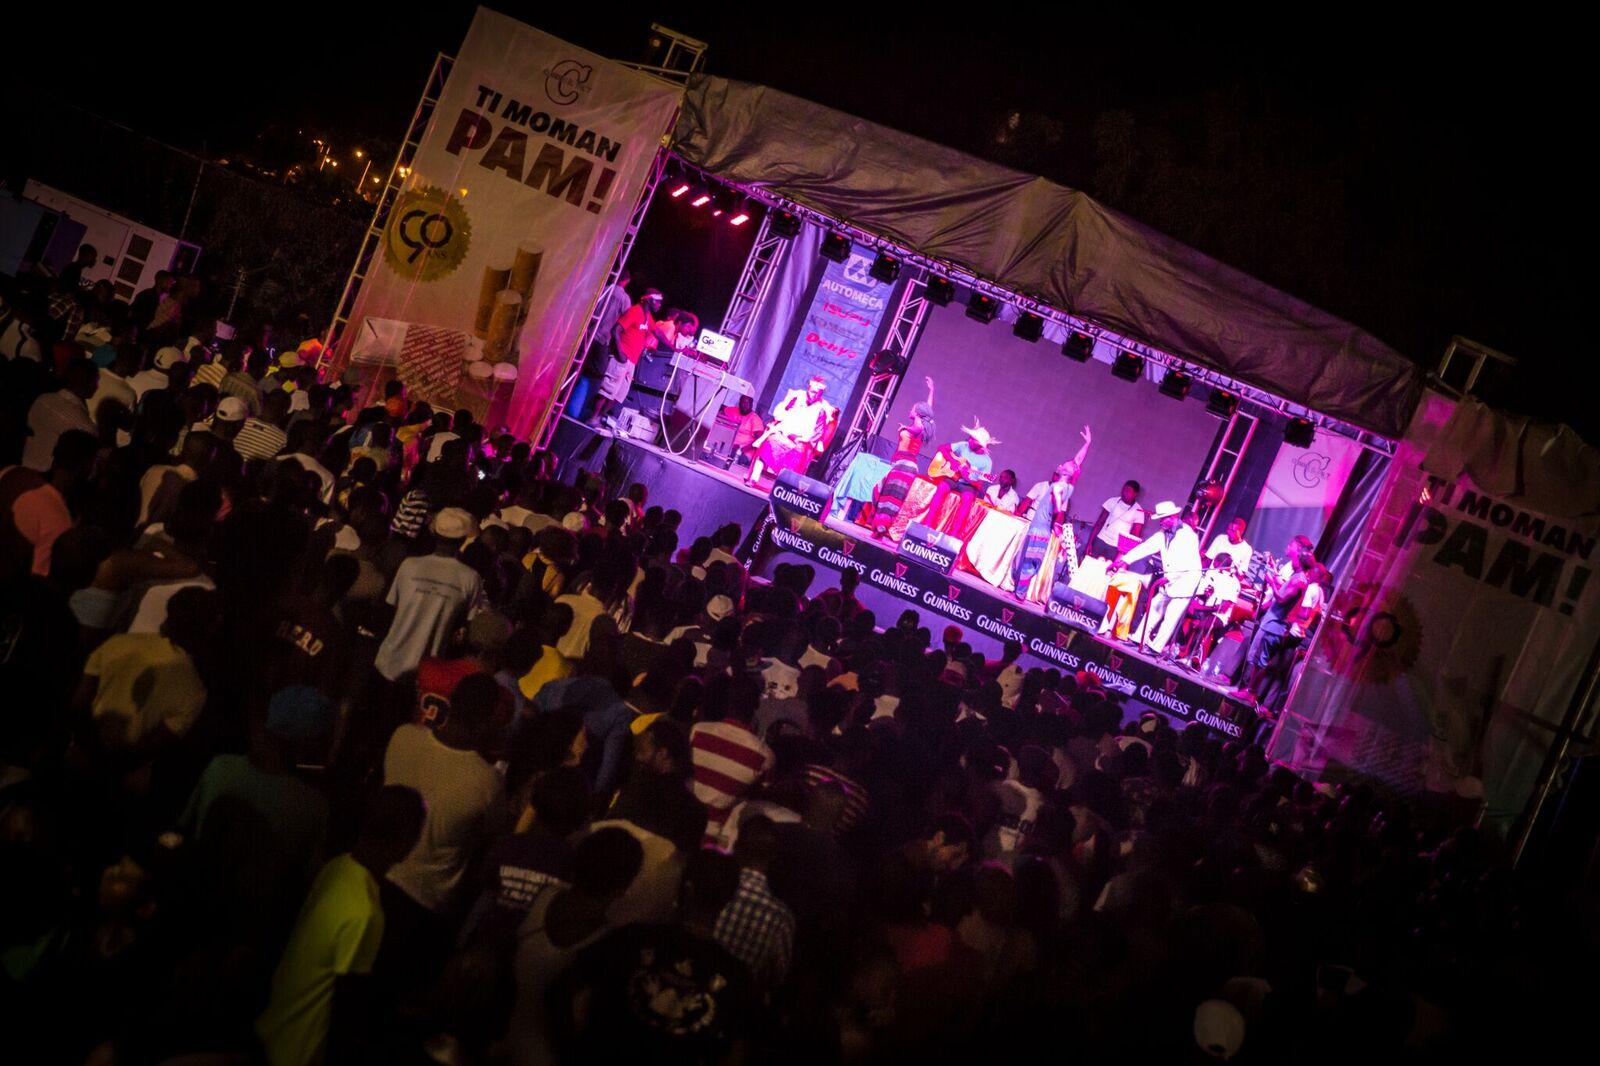 Festival Piman Bouk, Jacmel. Photo : MaxenceBradley Media